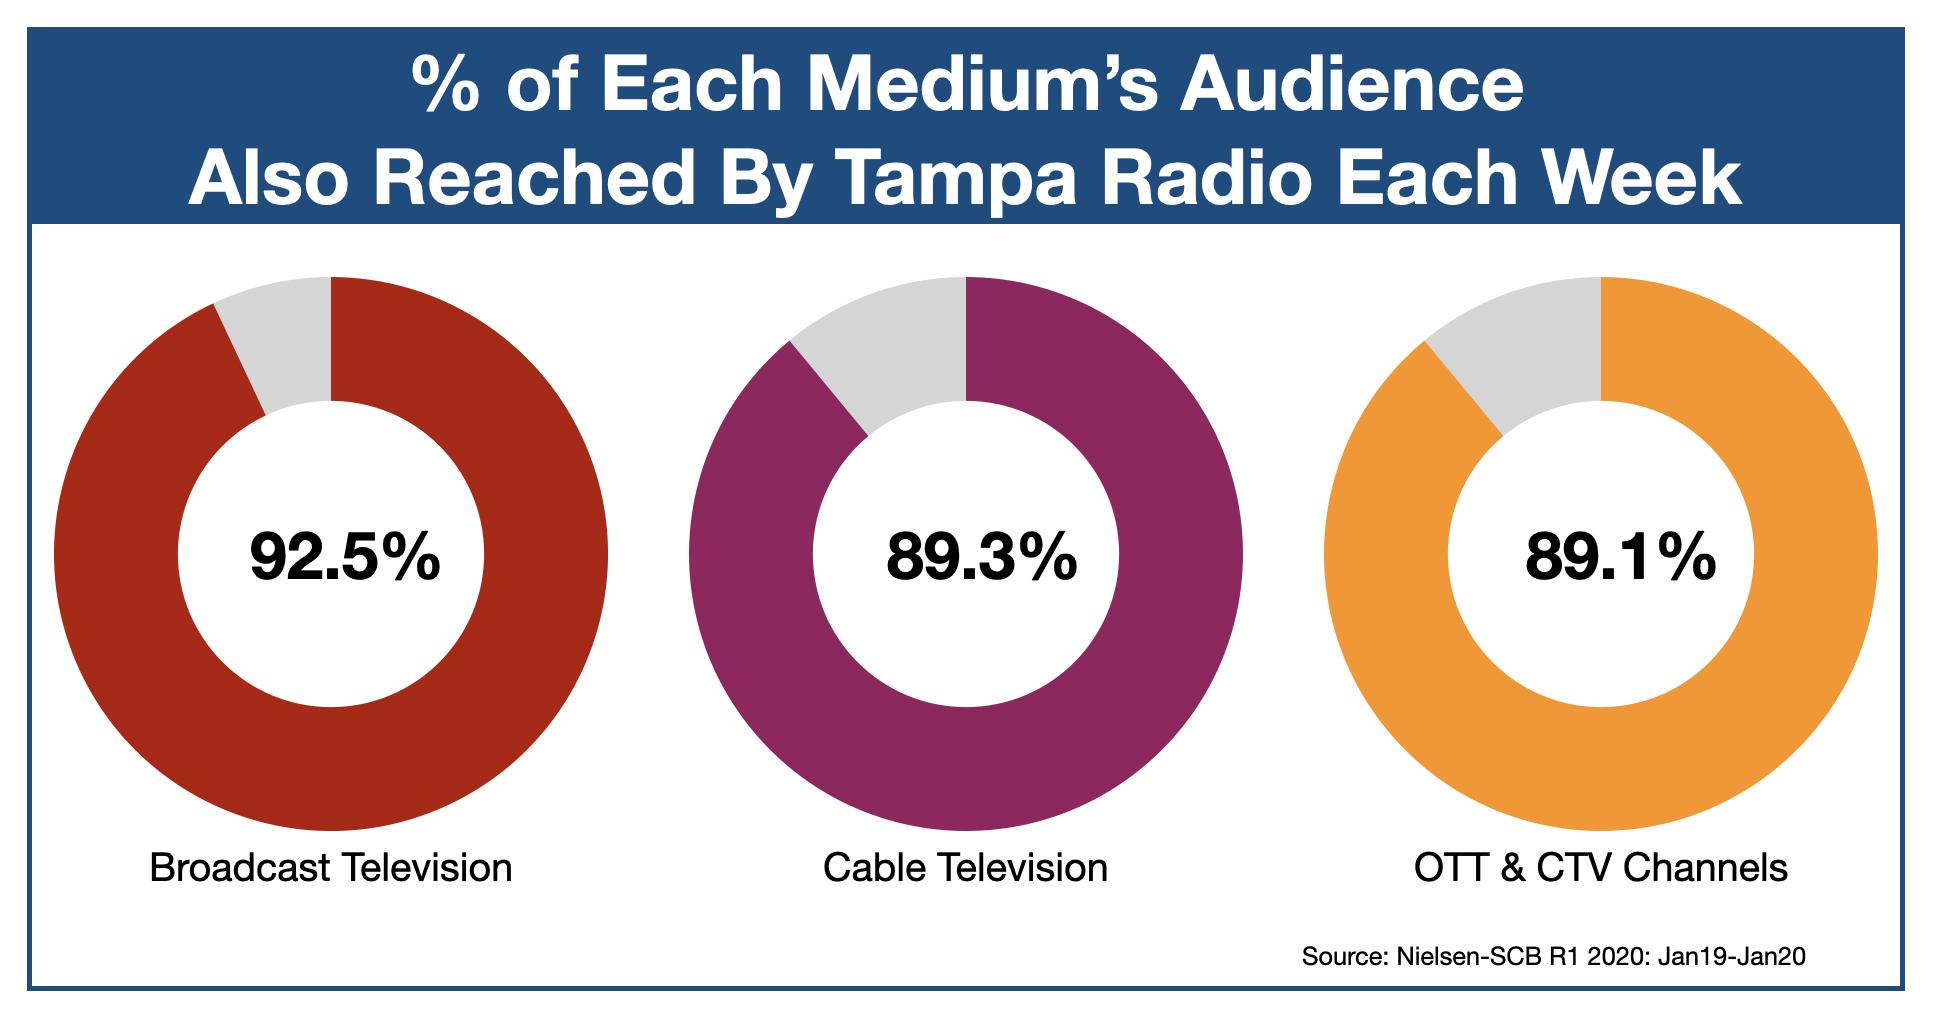 Advertising On Tampa Radio OTT & CTV